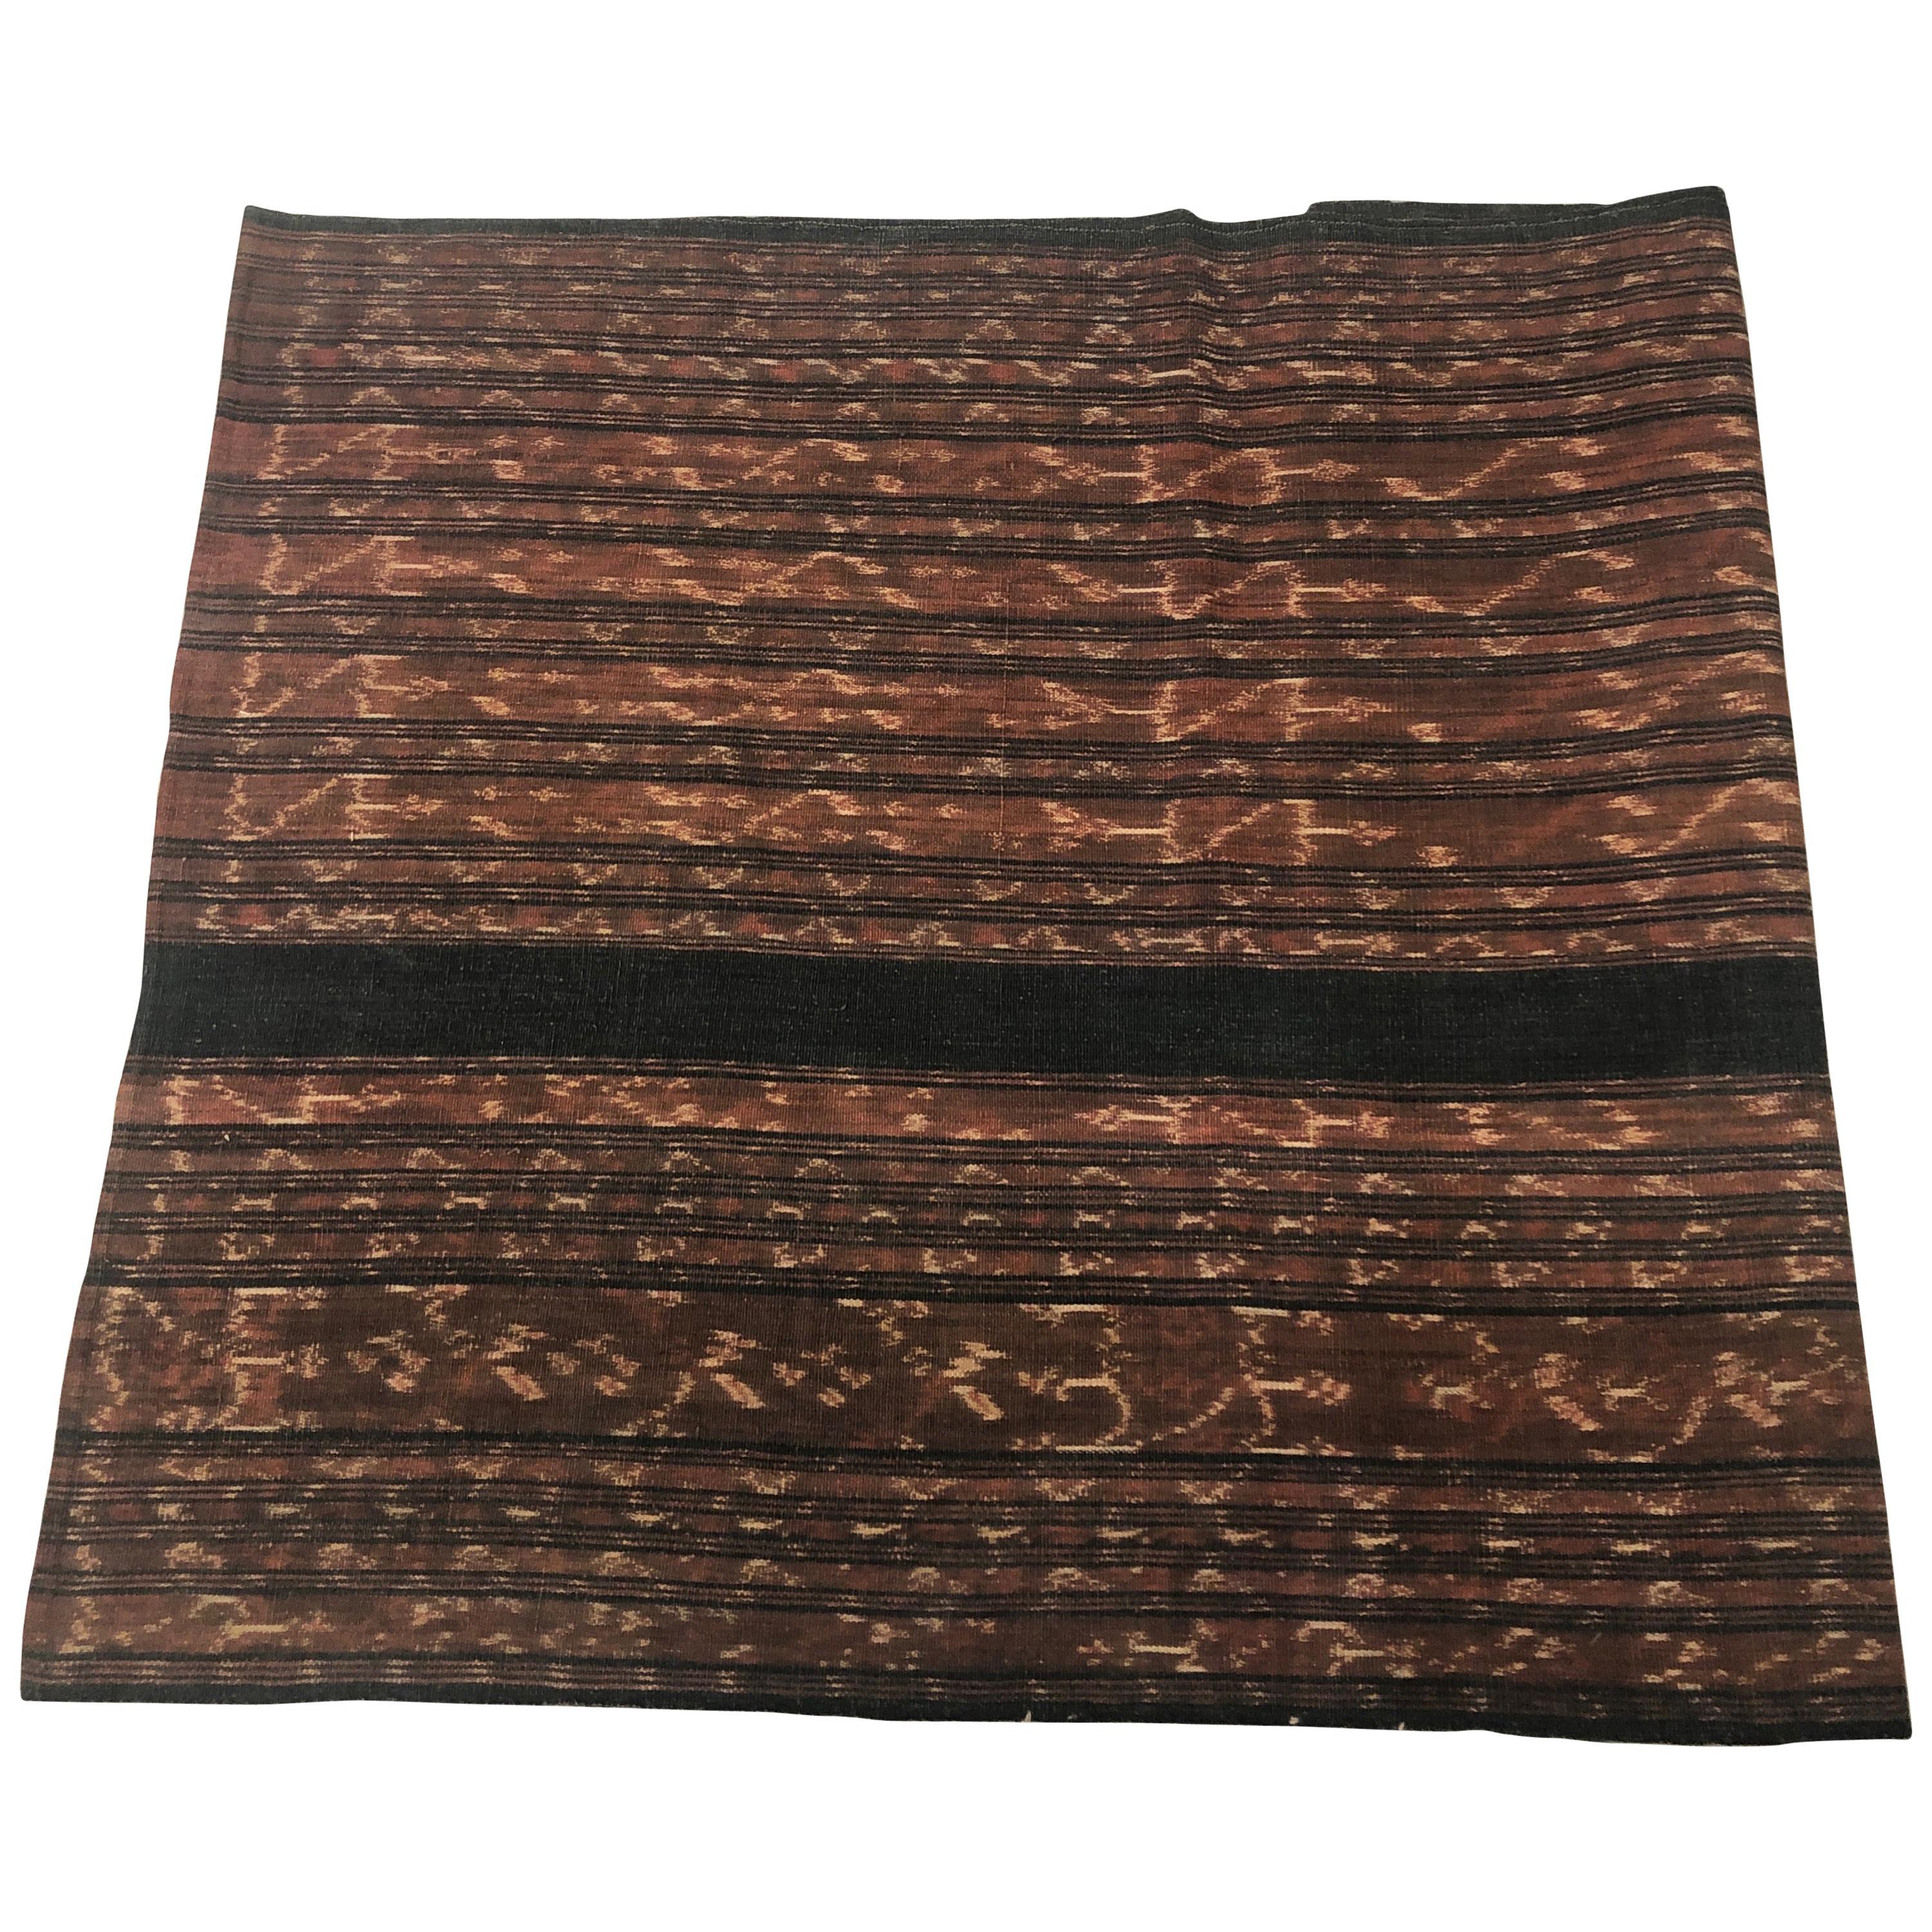 Vintage Indigo and Brown Ikat Textile Panel